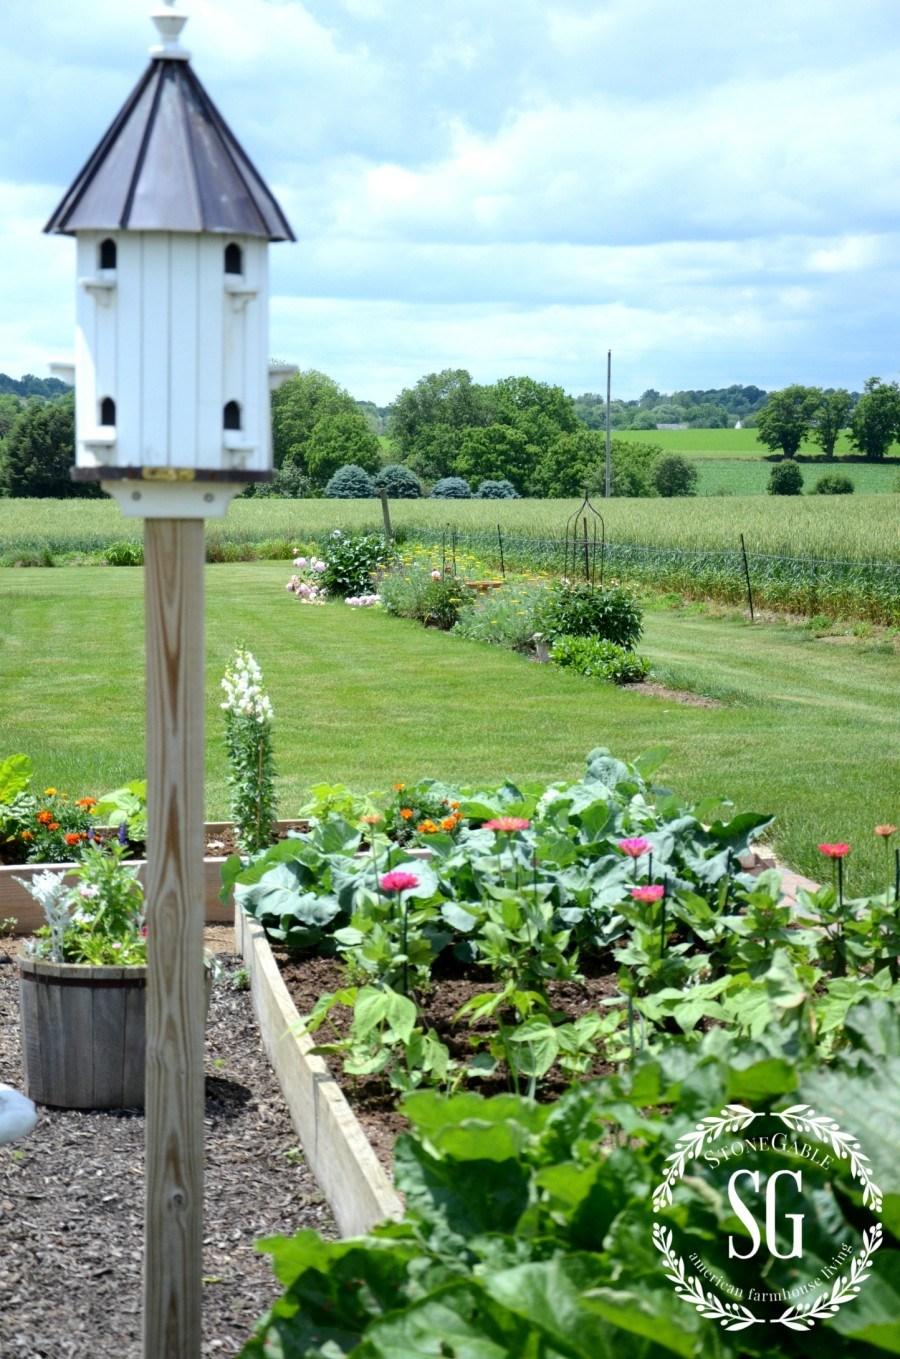 VEGETABLE GARDEN-birdhouse-vegetable garden-stonegableblog.com